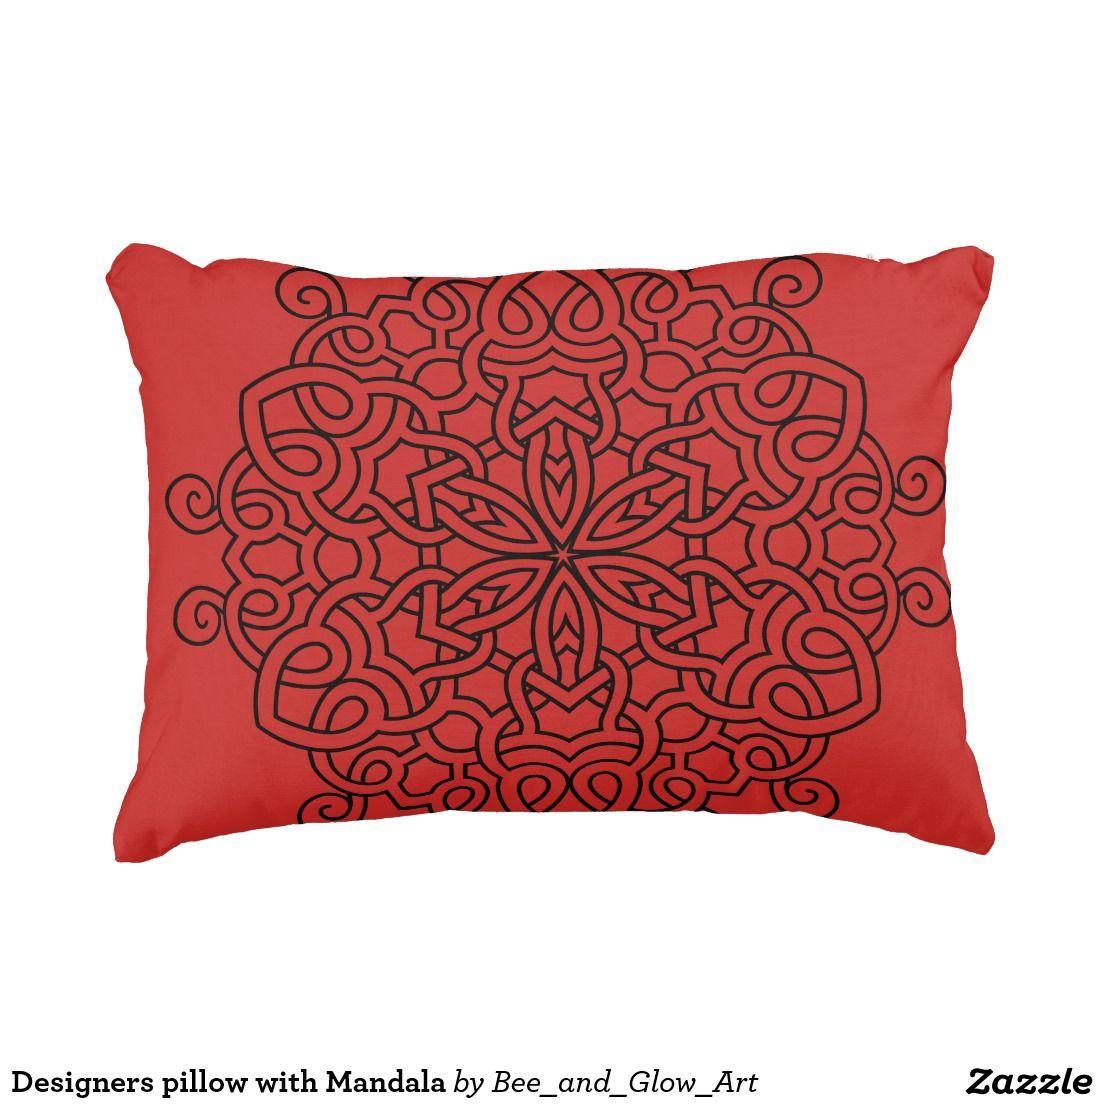 Designers pillow with Mandala